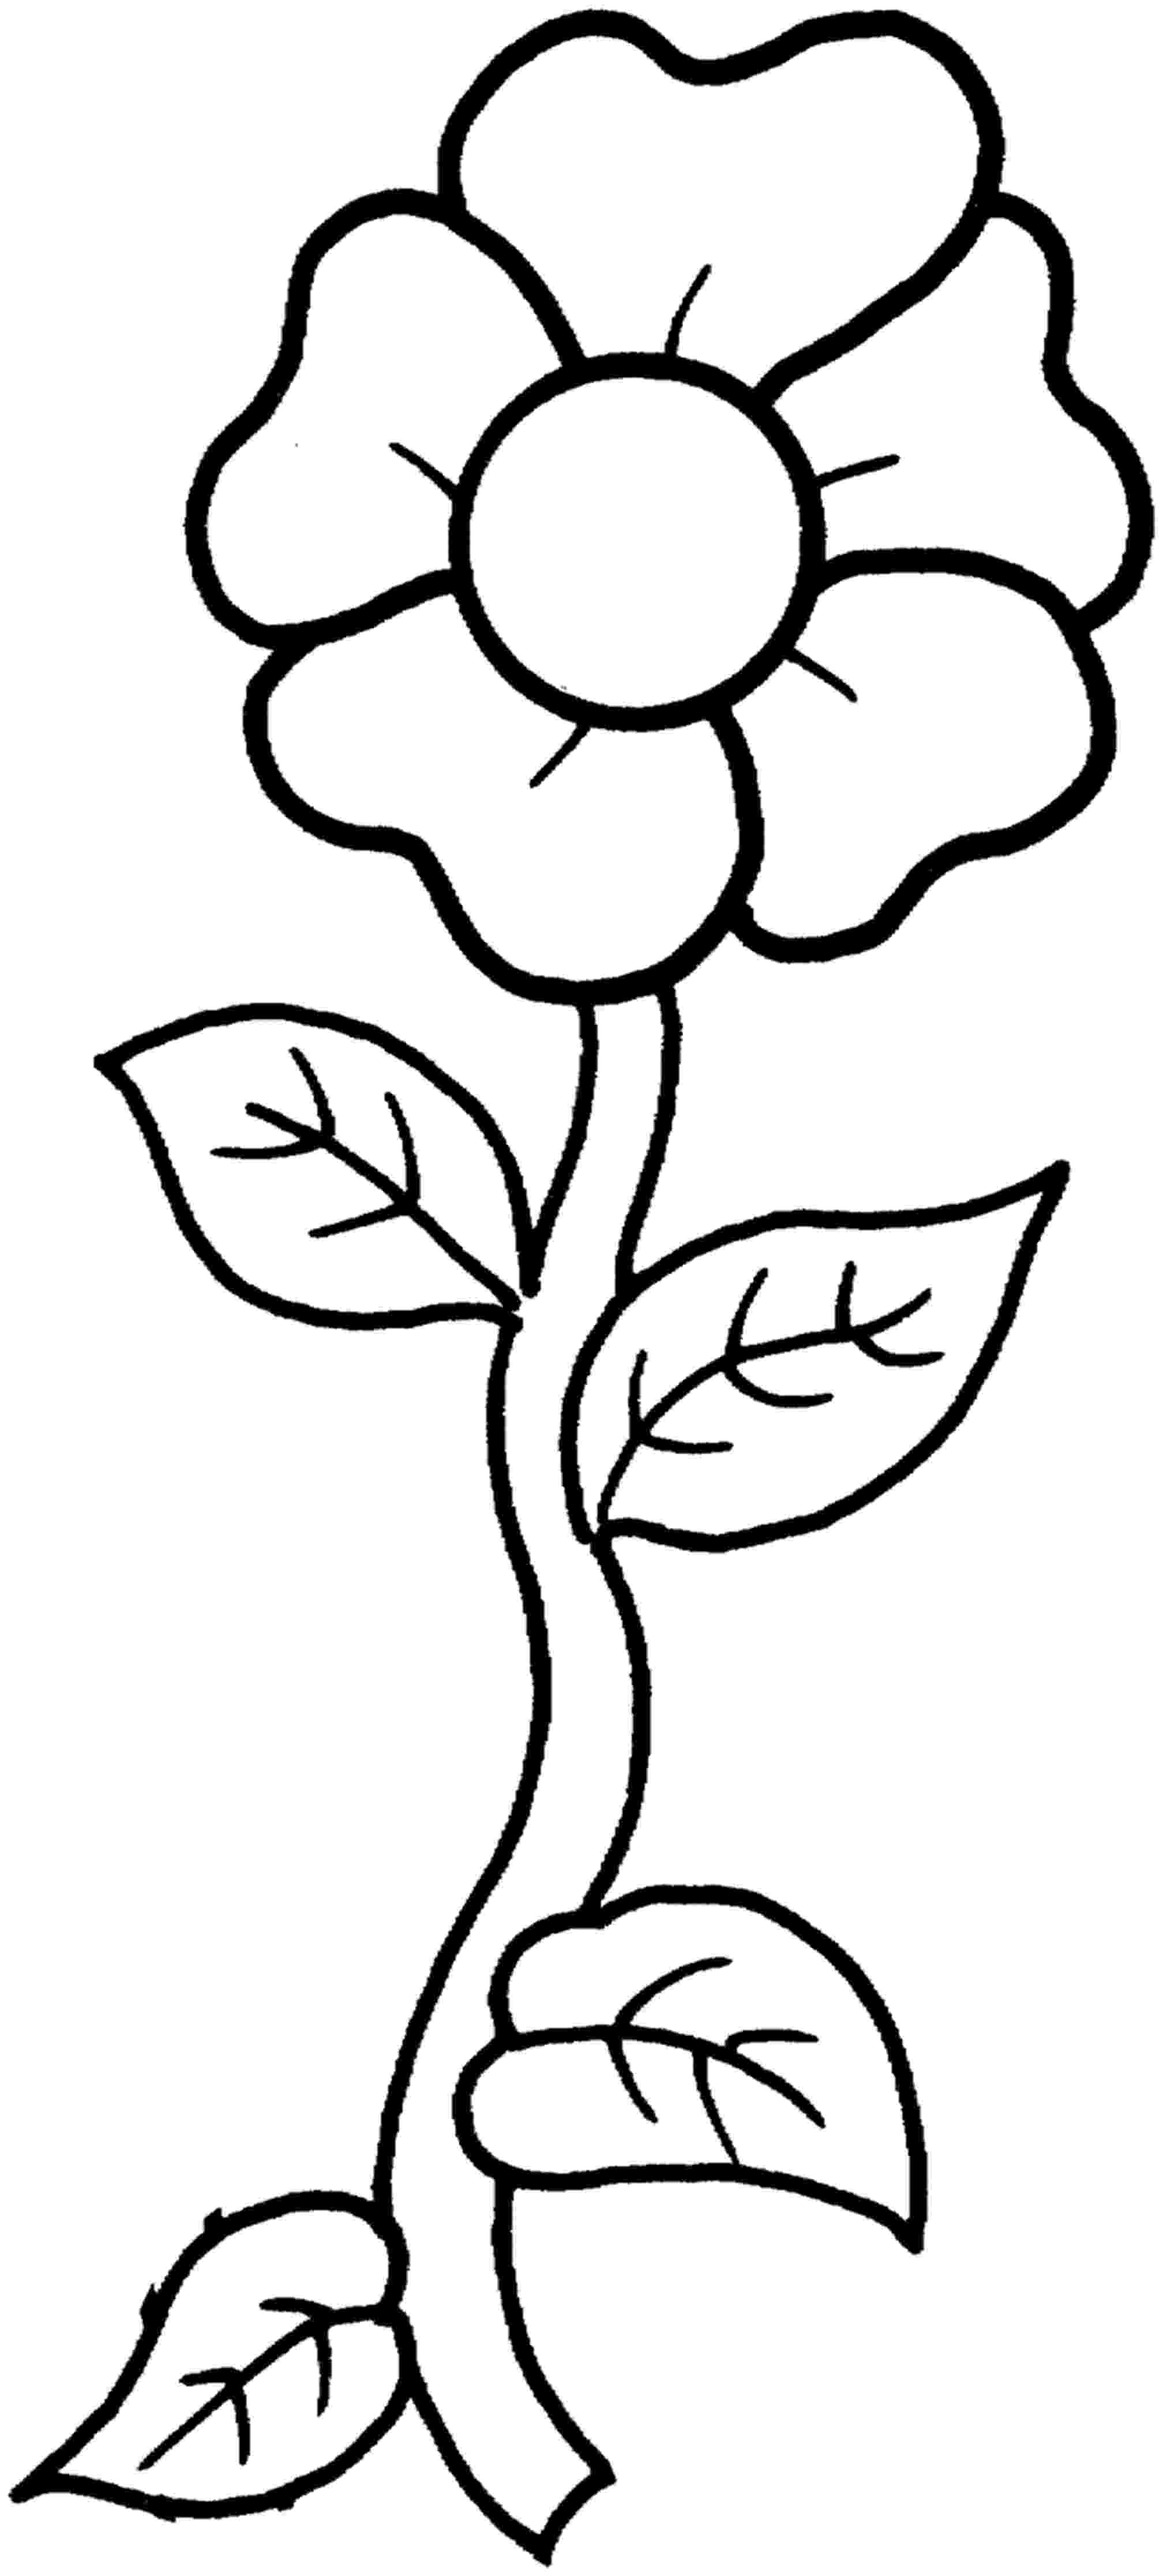 flower printouts free spring flower printable coloring image clip art printouts flower